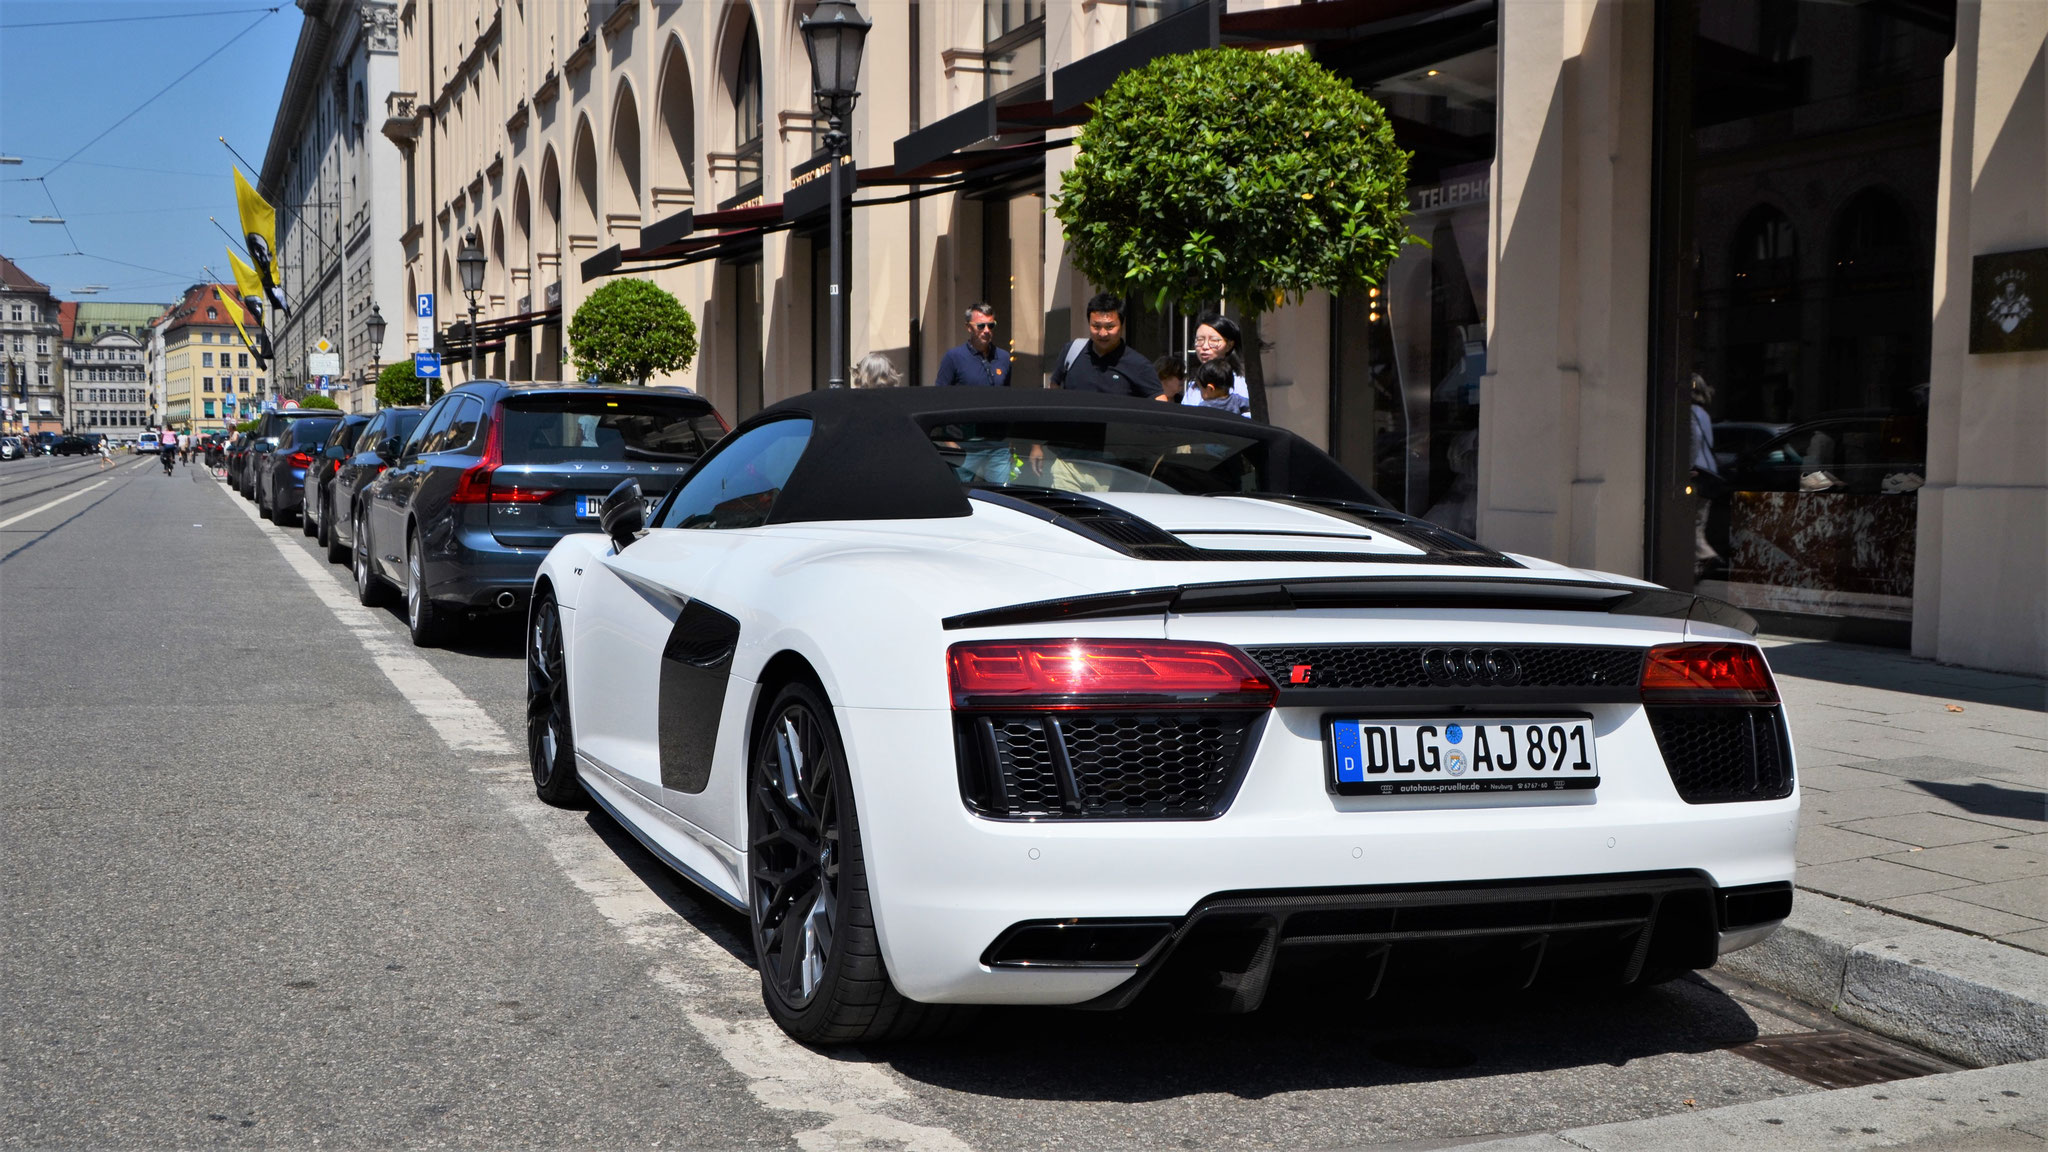 Audi R8 V10 Spyder - DLG-AJ-891